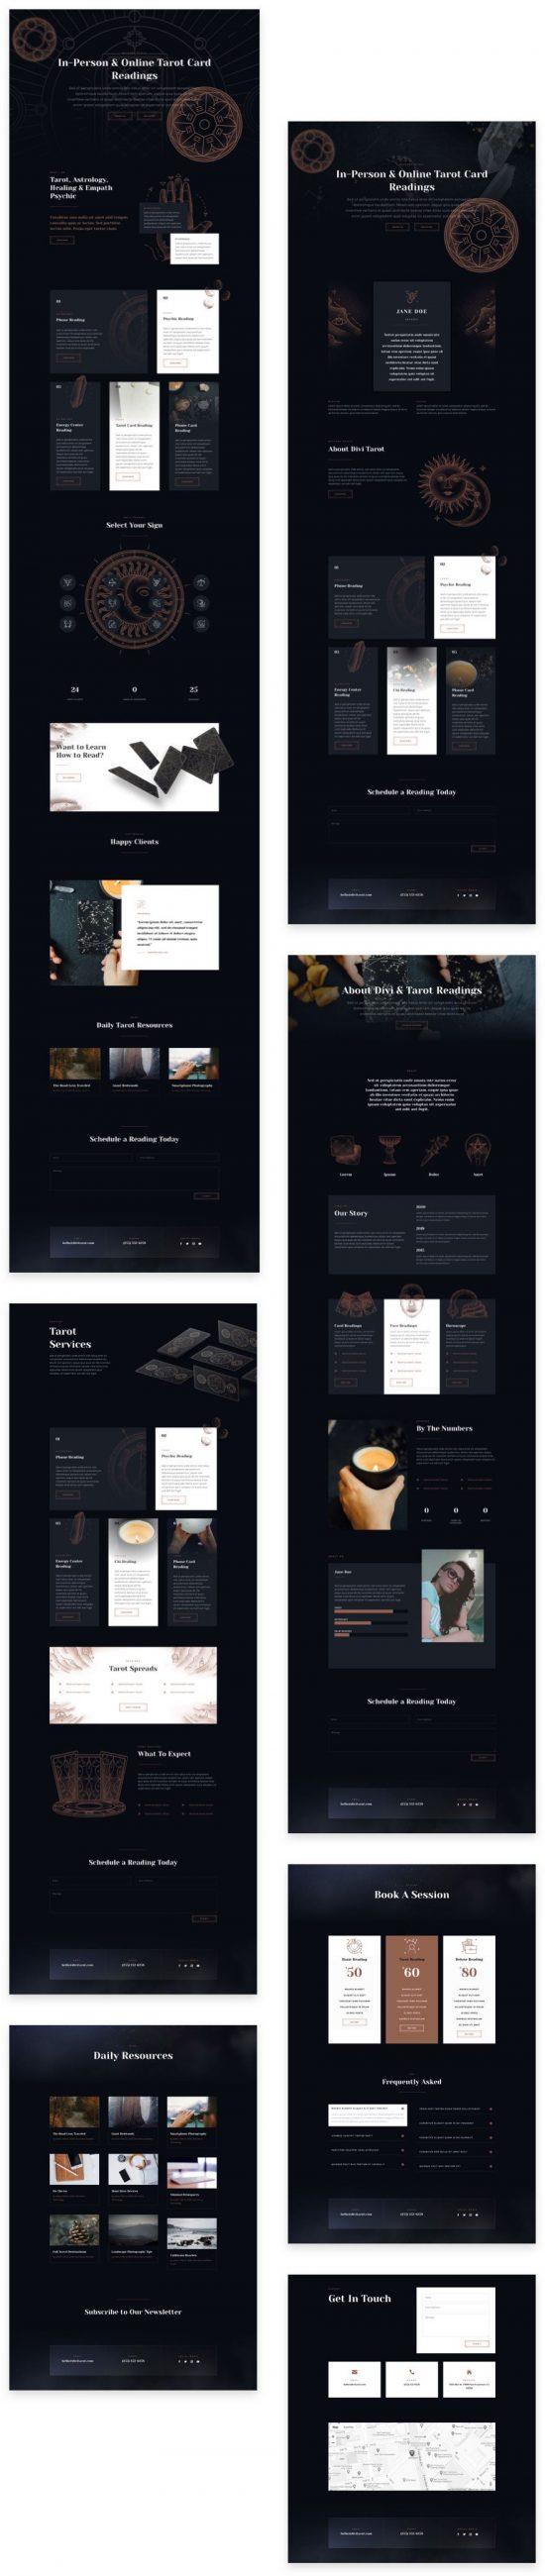 divi tarot wordpress layout by elegant themes 01 550x2601 - Divi Tarot WordPress Layout By Elegant Themes